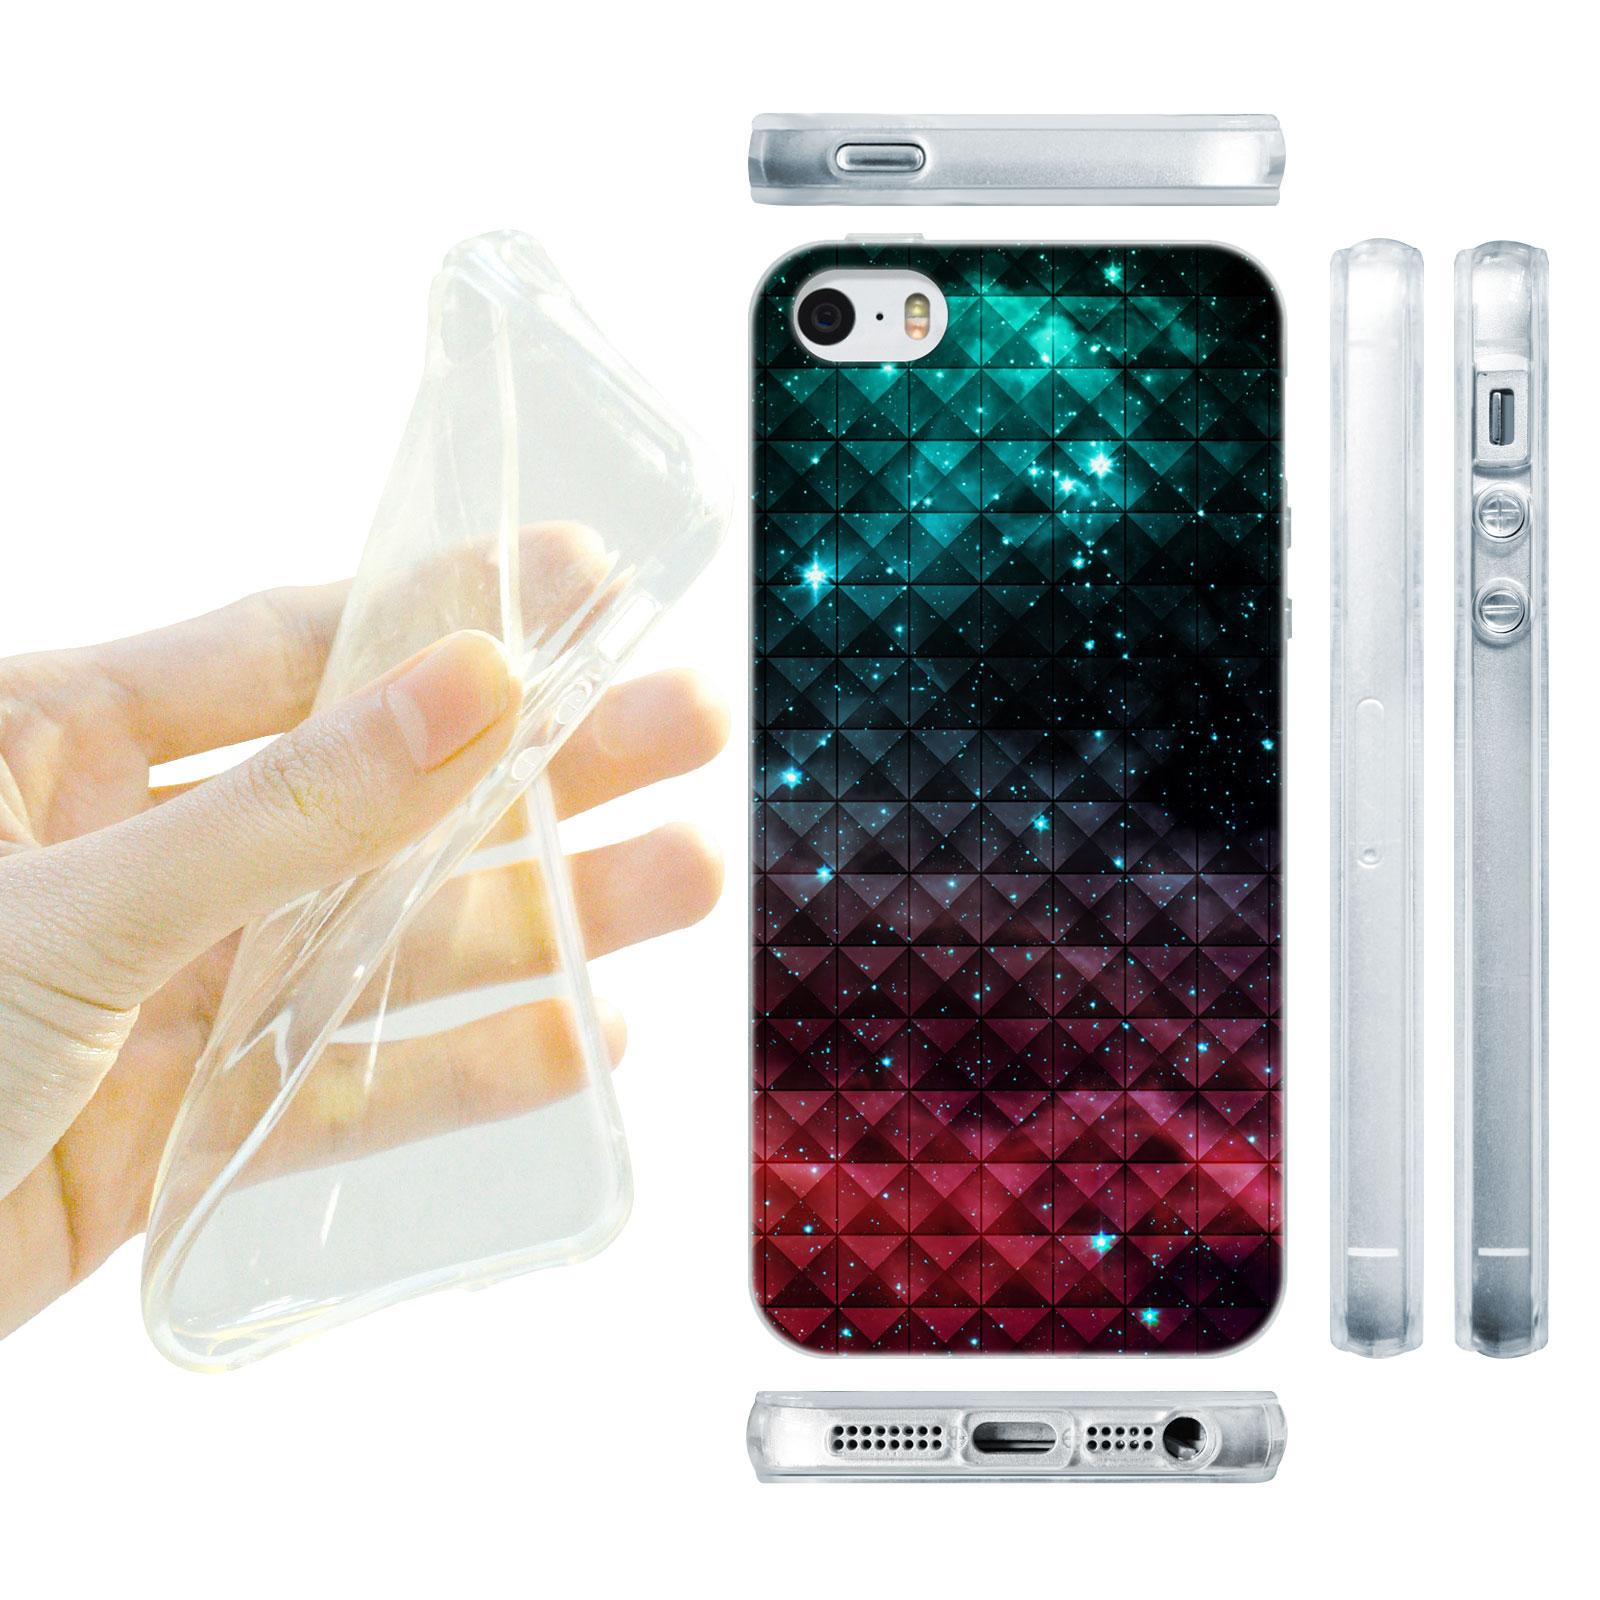 b8a29614e1 HEAD CASE silikonový obal na mobil Iphone 5 5S vzor vesmír modrá a červená  hvězdy